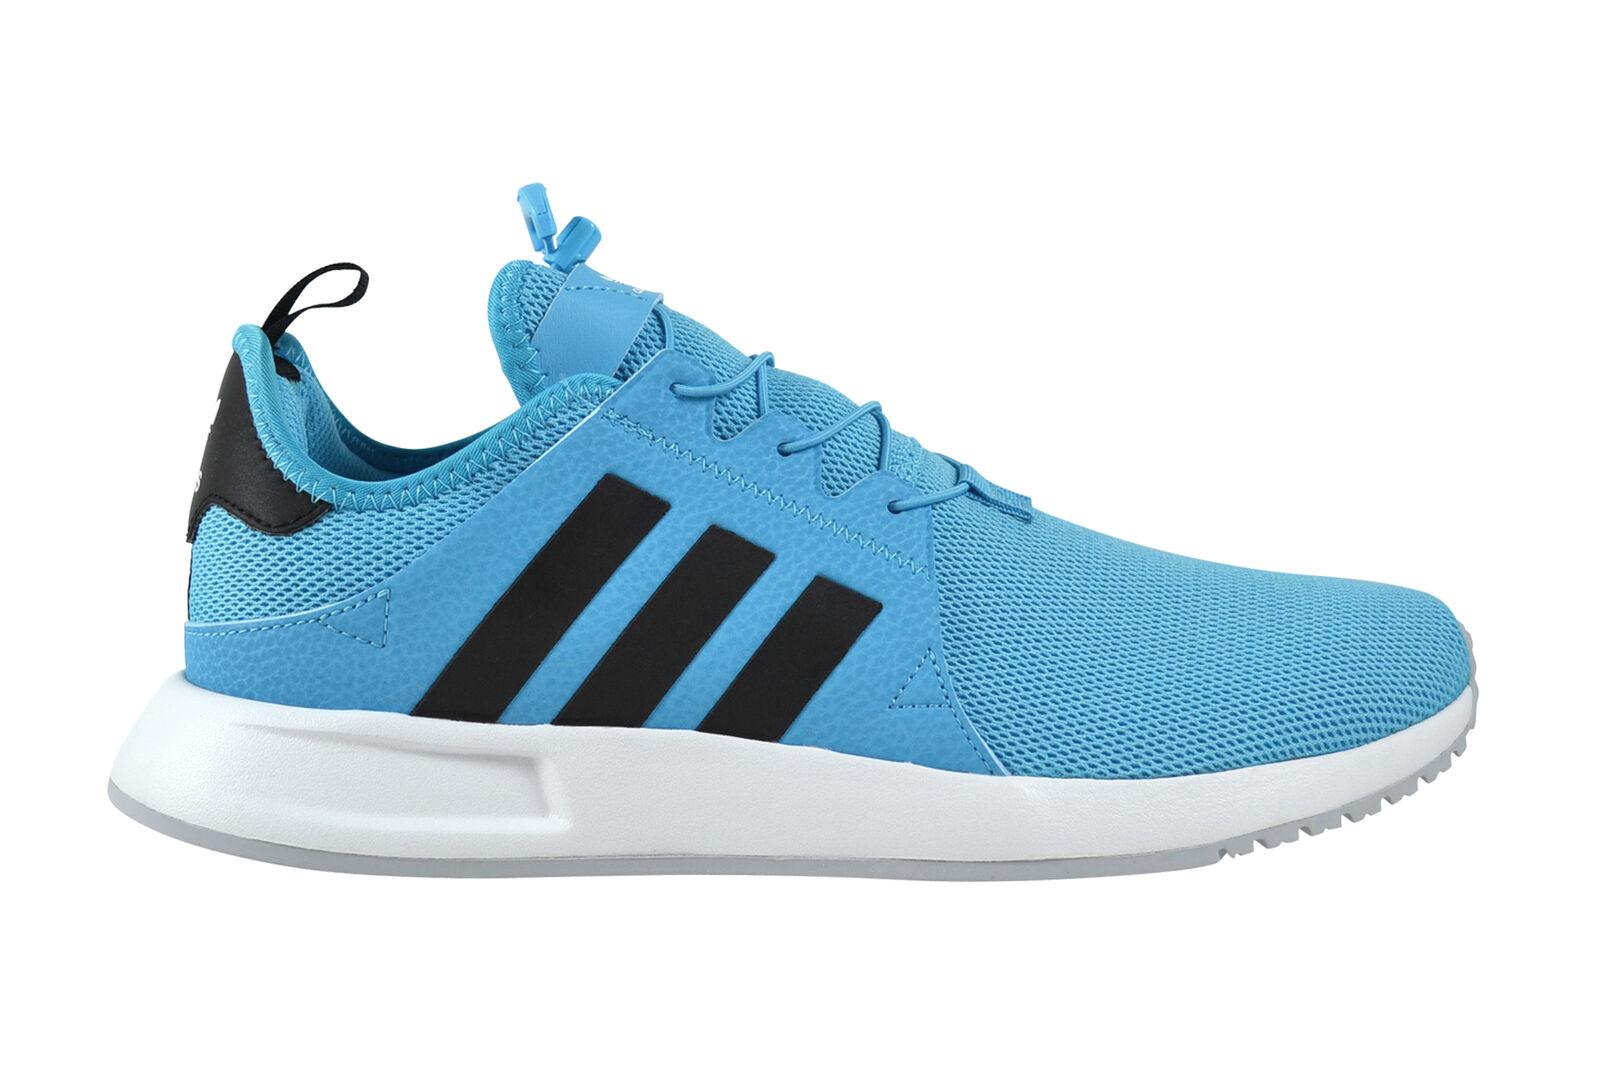 Adidas Plr Core Footwear Bright Black Cyan White X rrwx4qH7